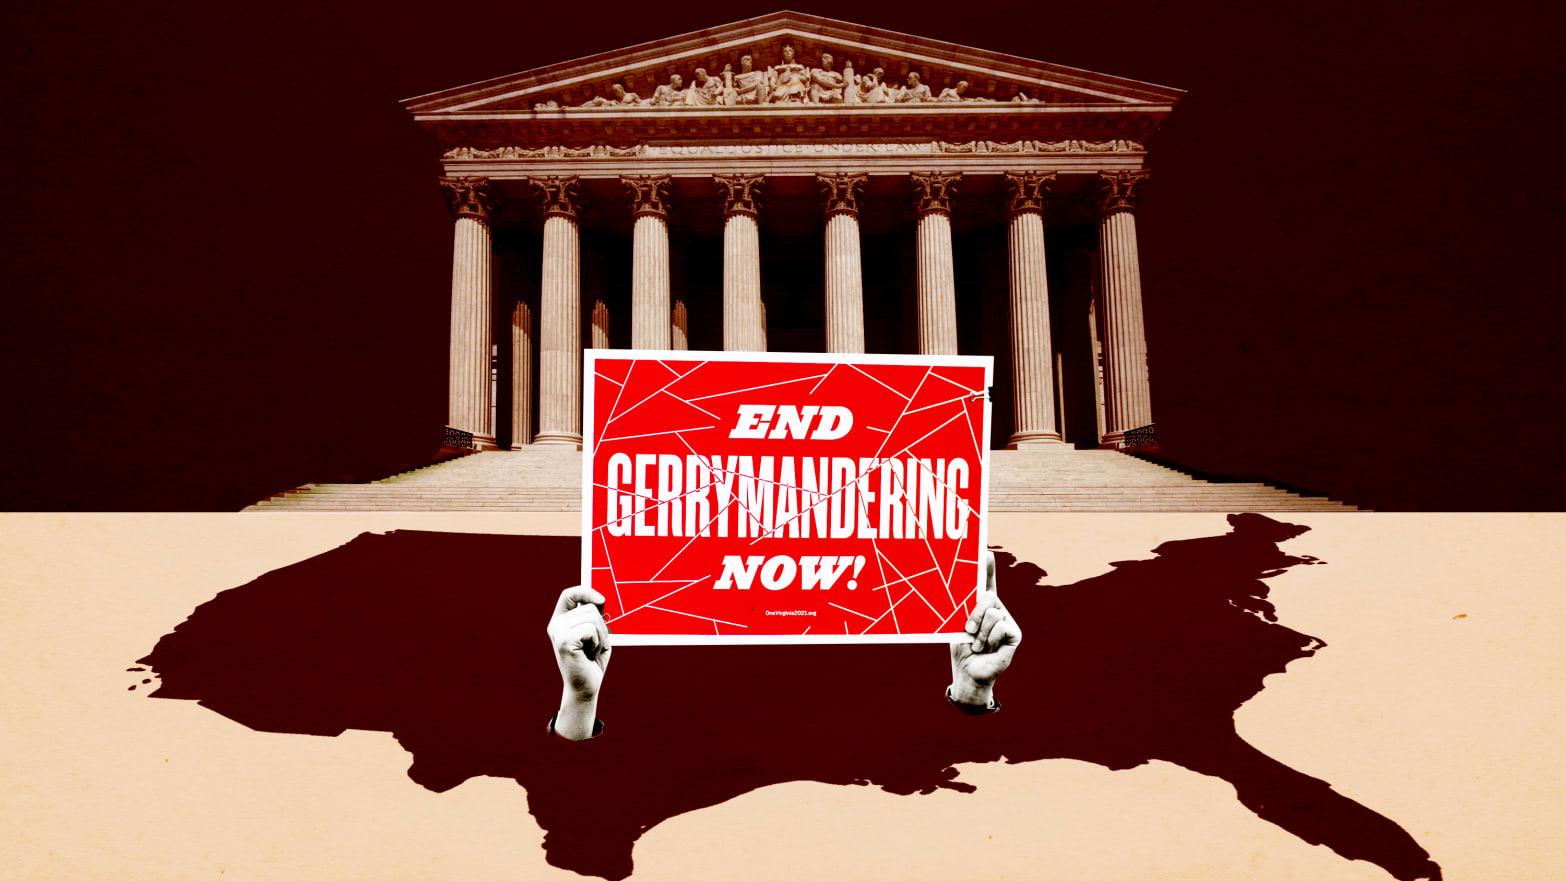 Kavanaugh, Supreme Court Ready to Unleash Partisan Gerrymandering